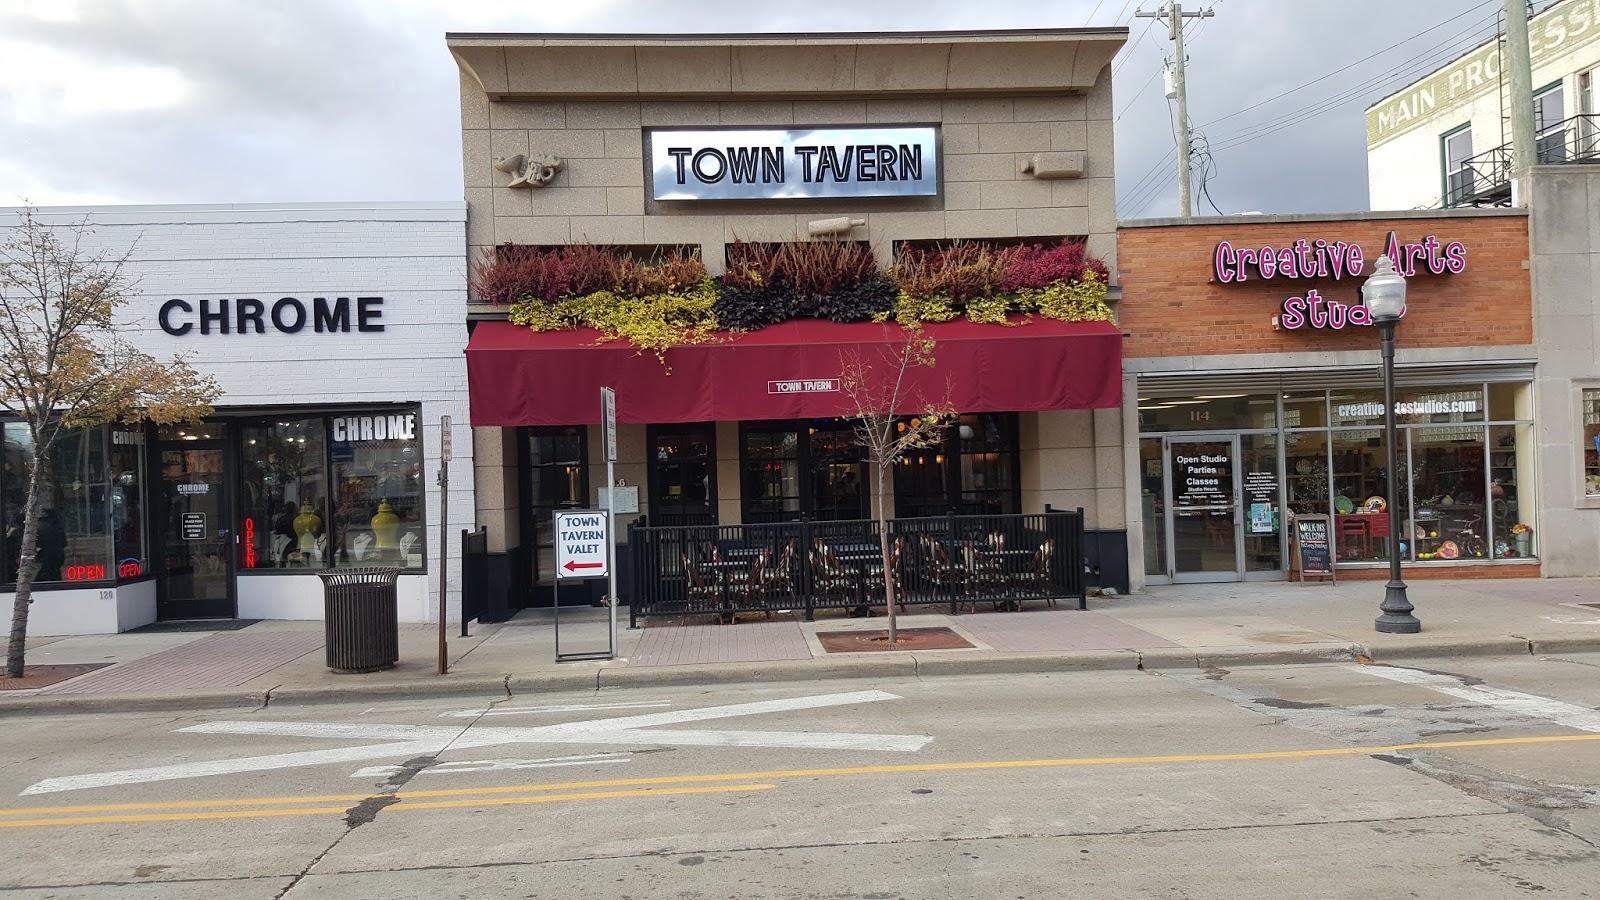 Town Tavern in Royal Oak, Michigan